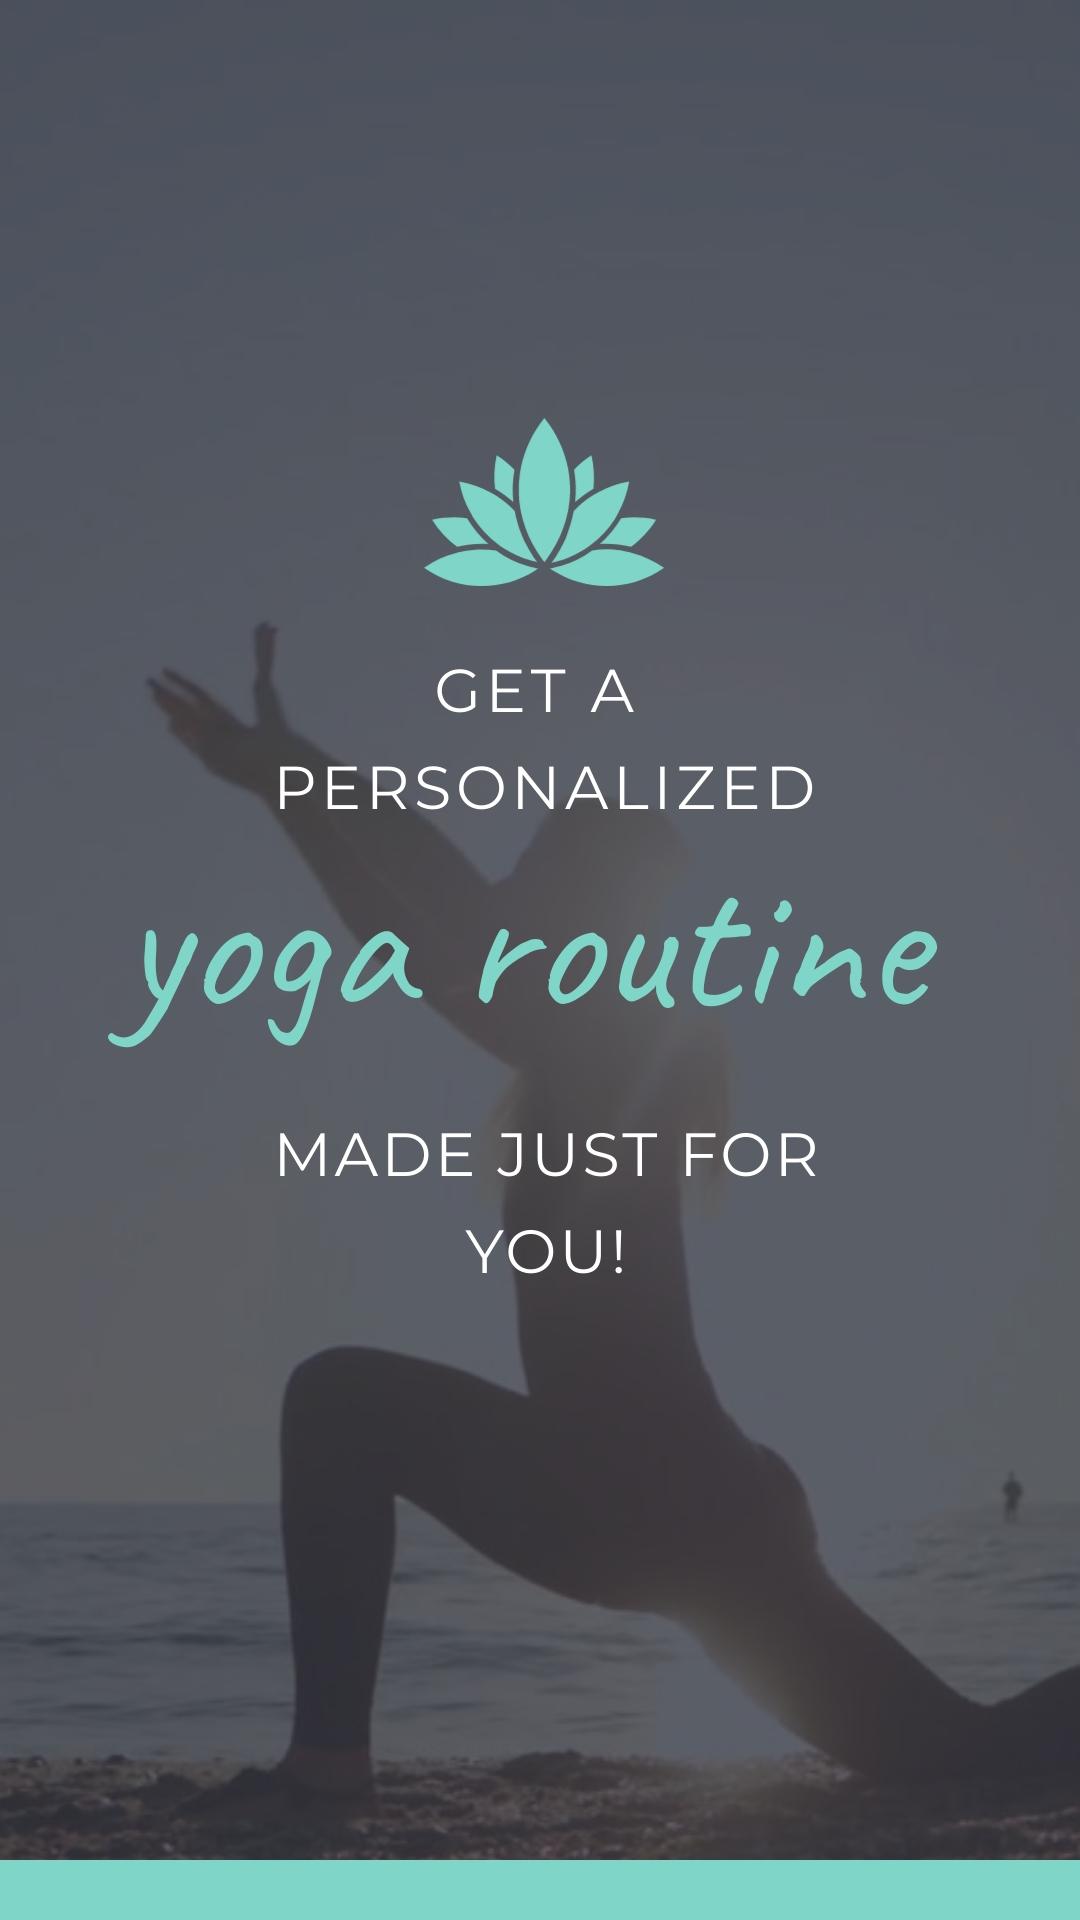 Yoga App - Instagram Video Ad Template